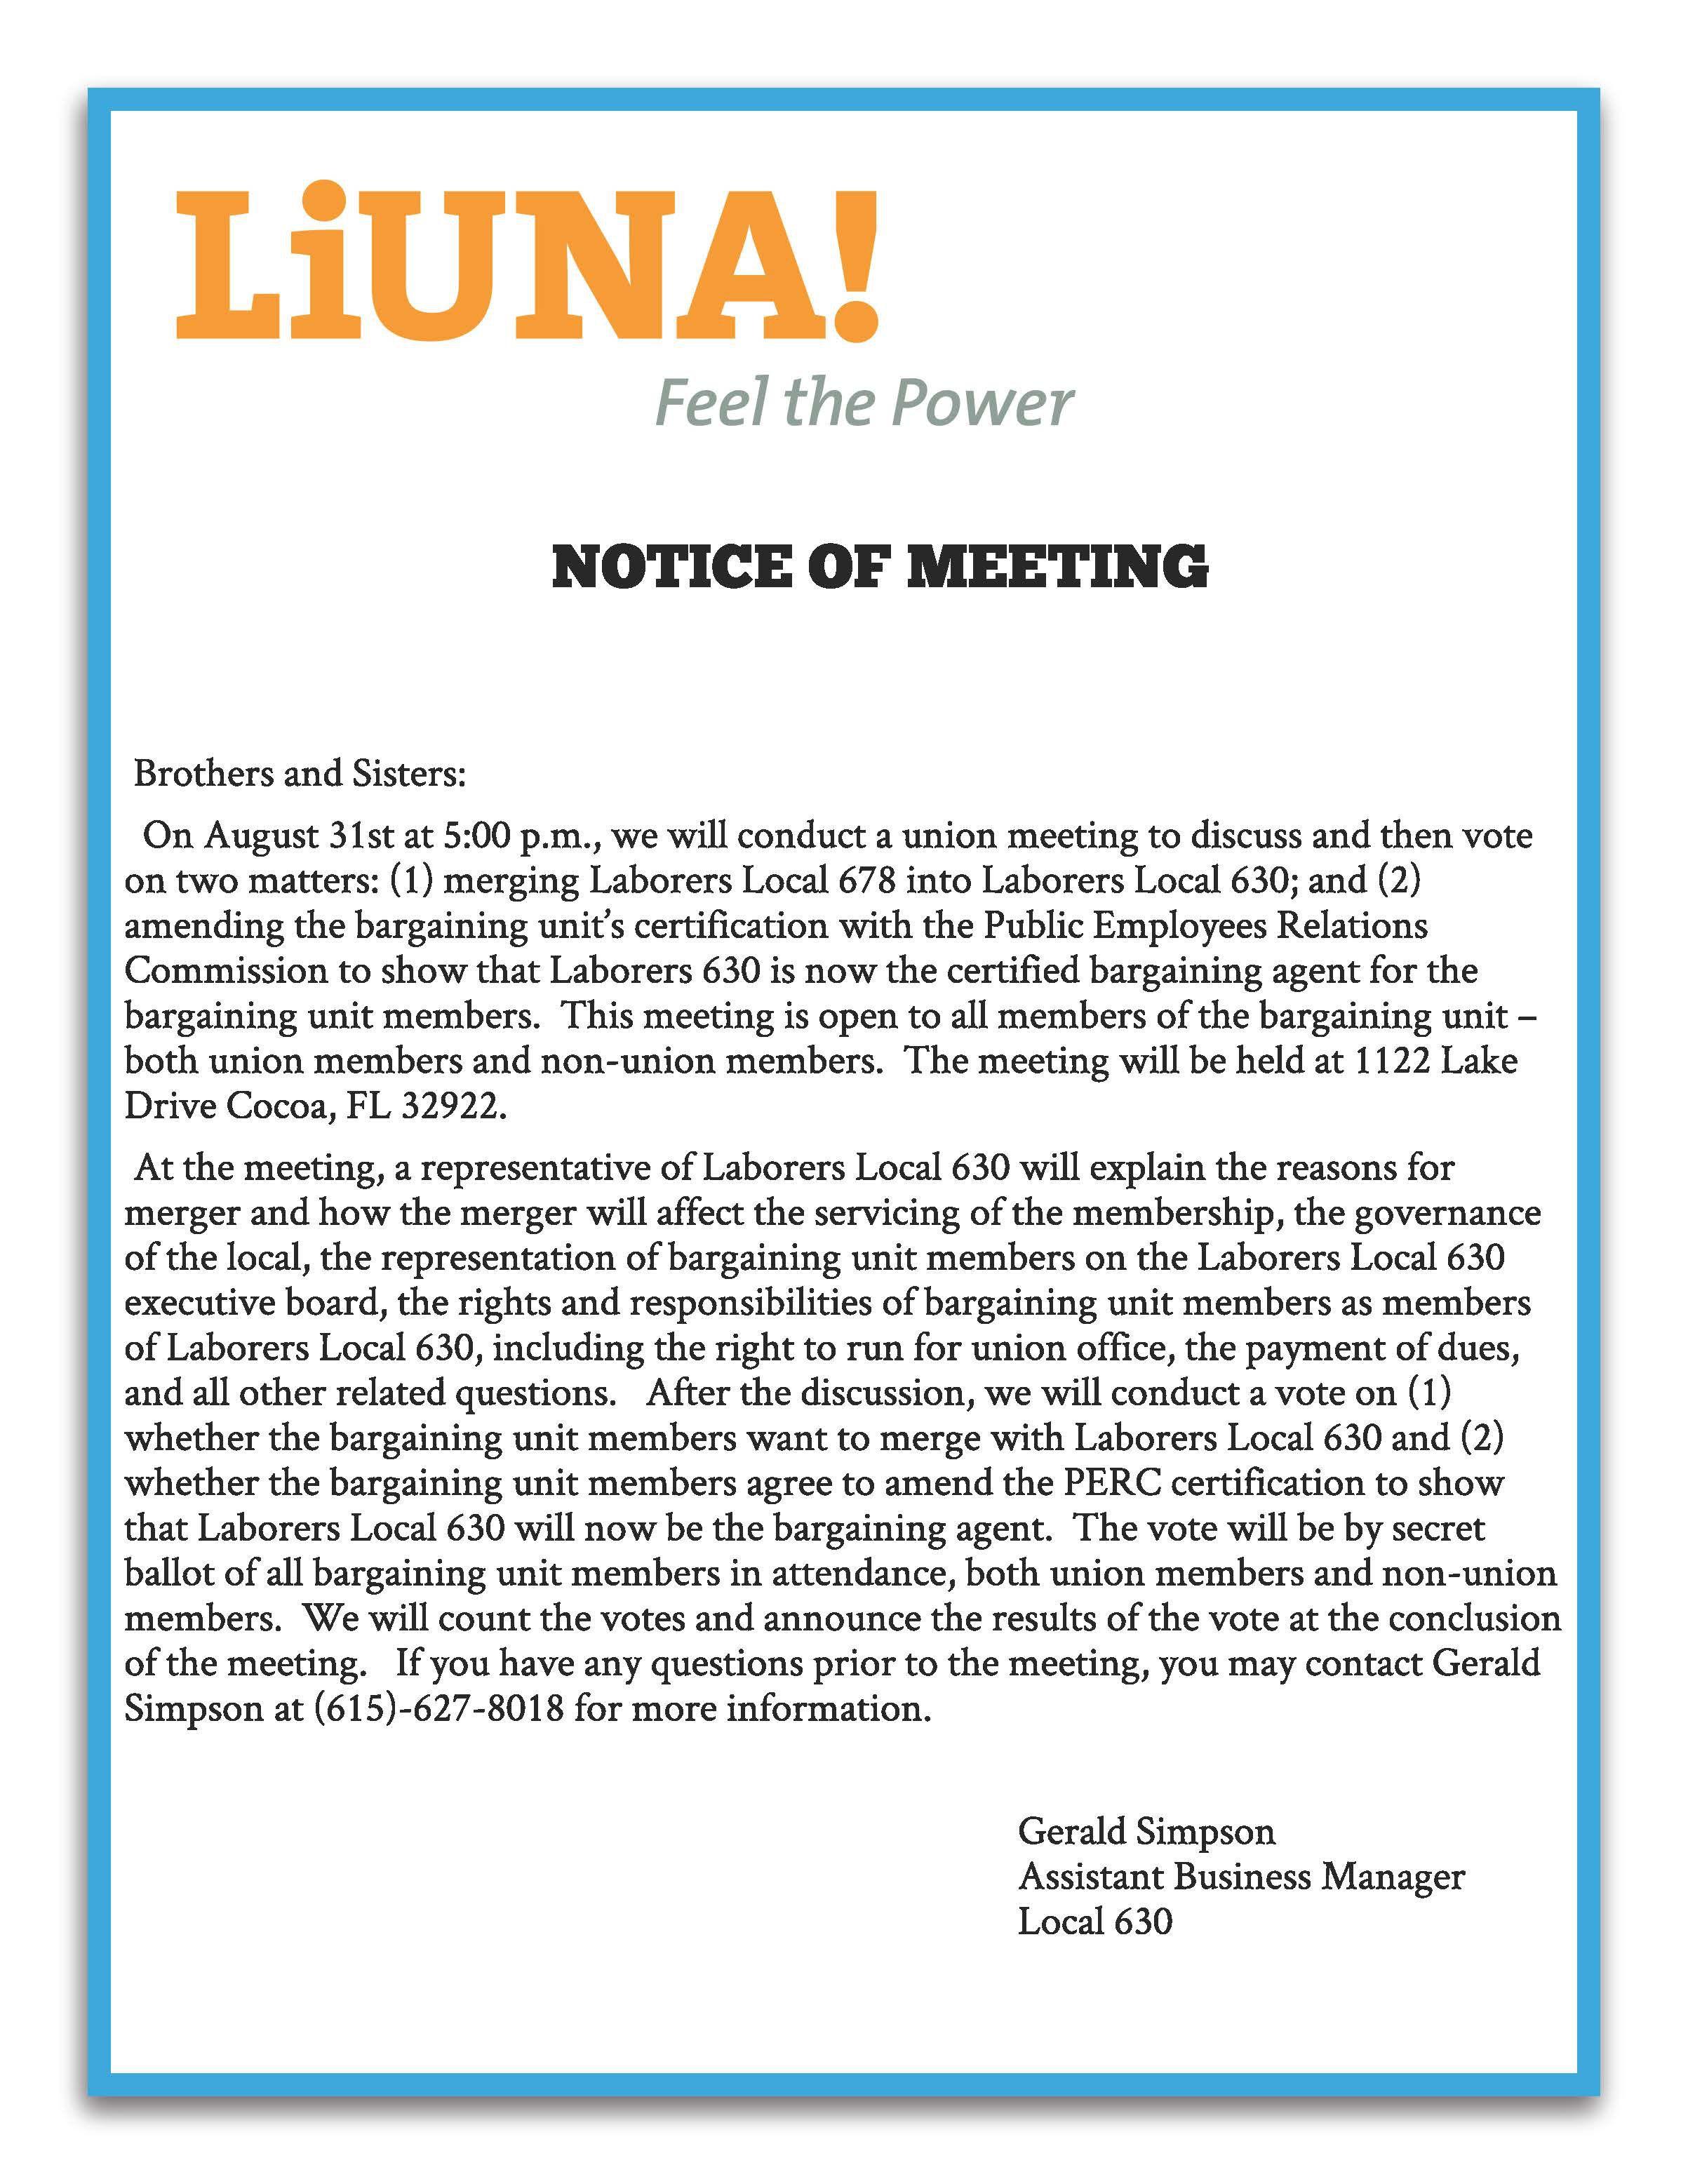 notice to members (Aug 31st).jpg